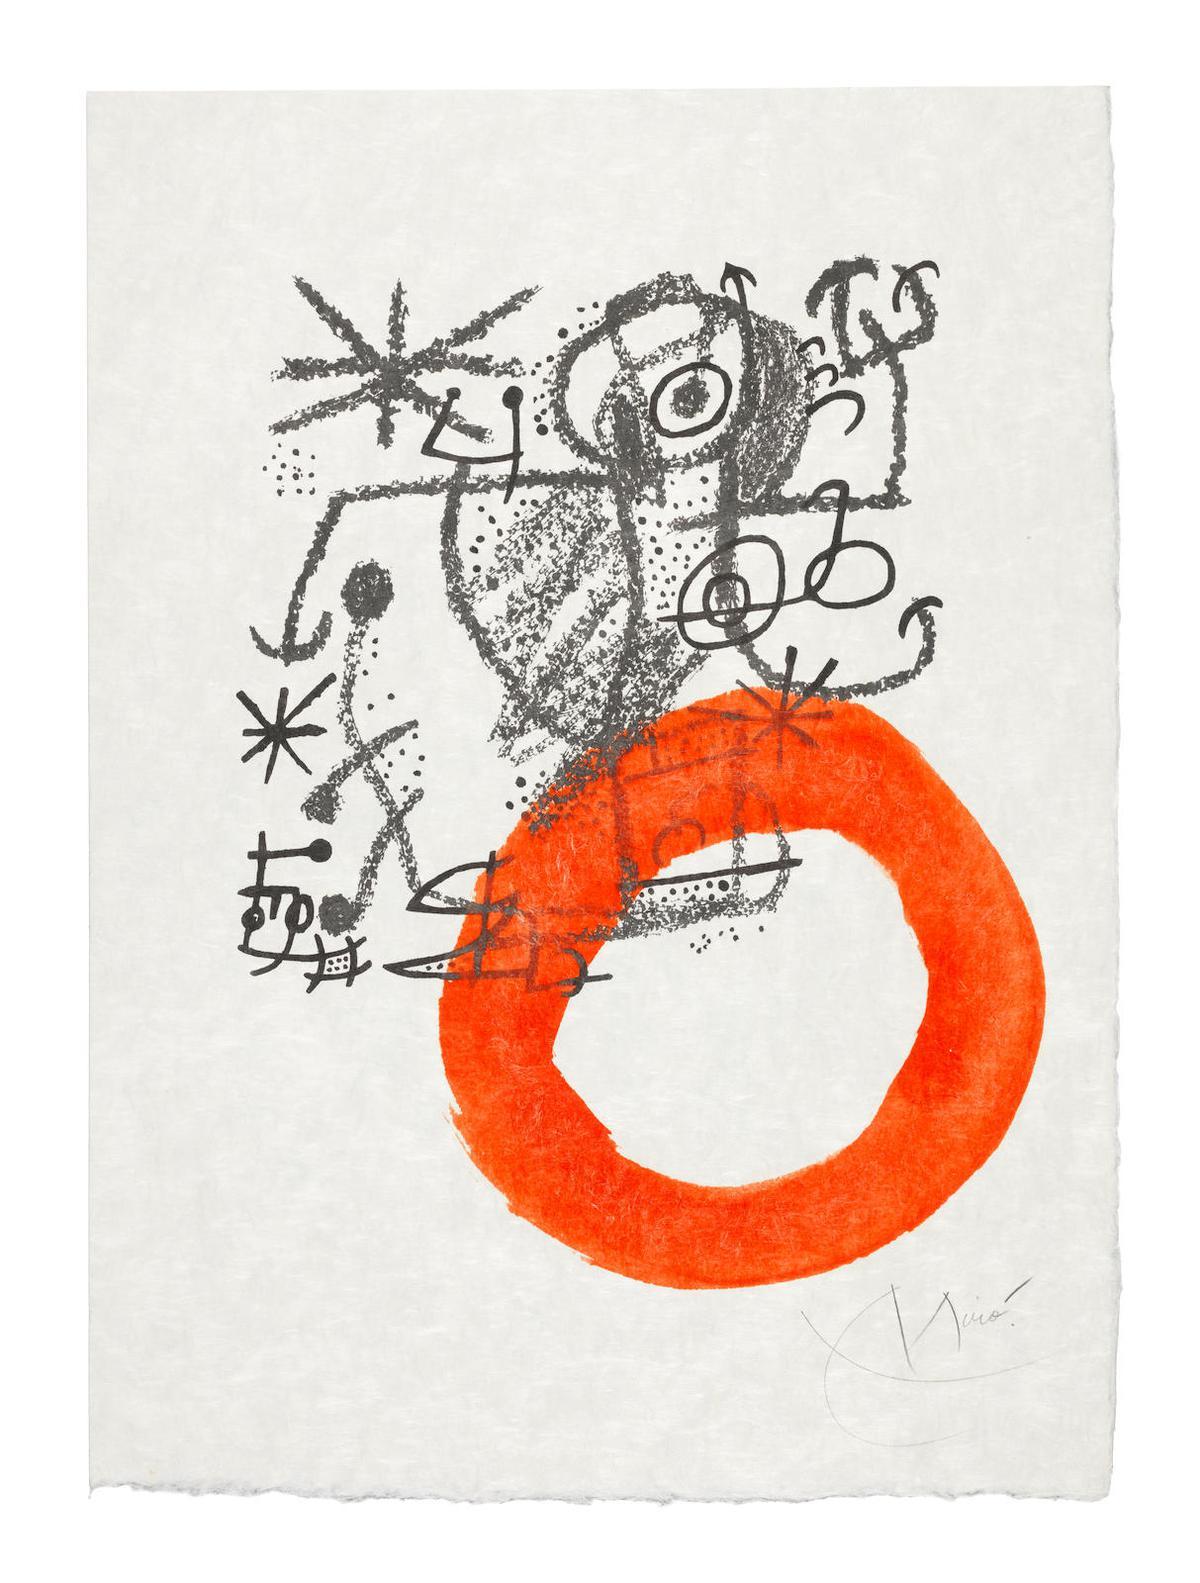 Joan Miro-One Plate, from Les Essencies de la Terra (Mourlot 577; Cramer Books 123)-1968